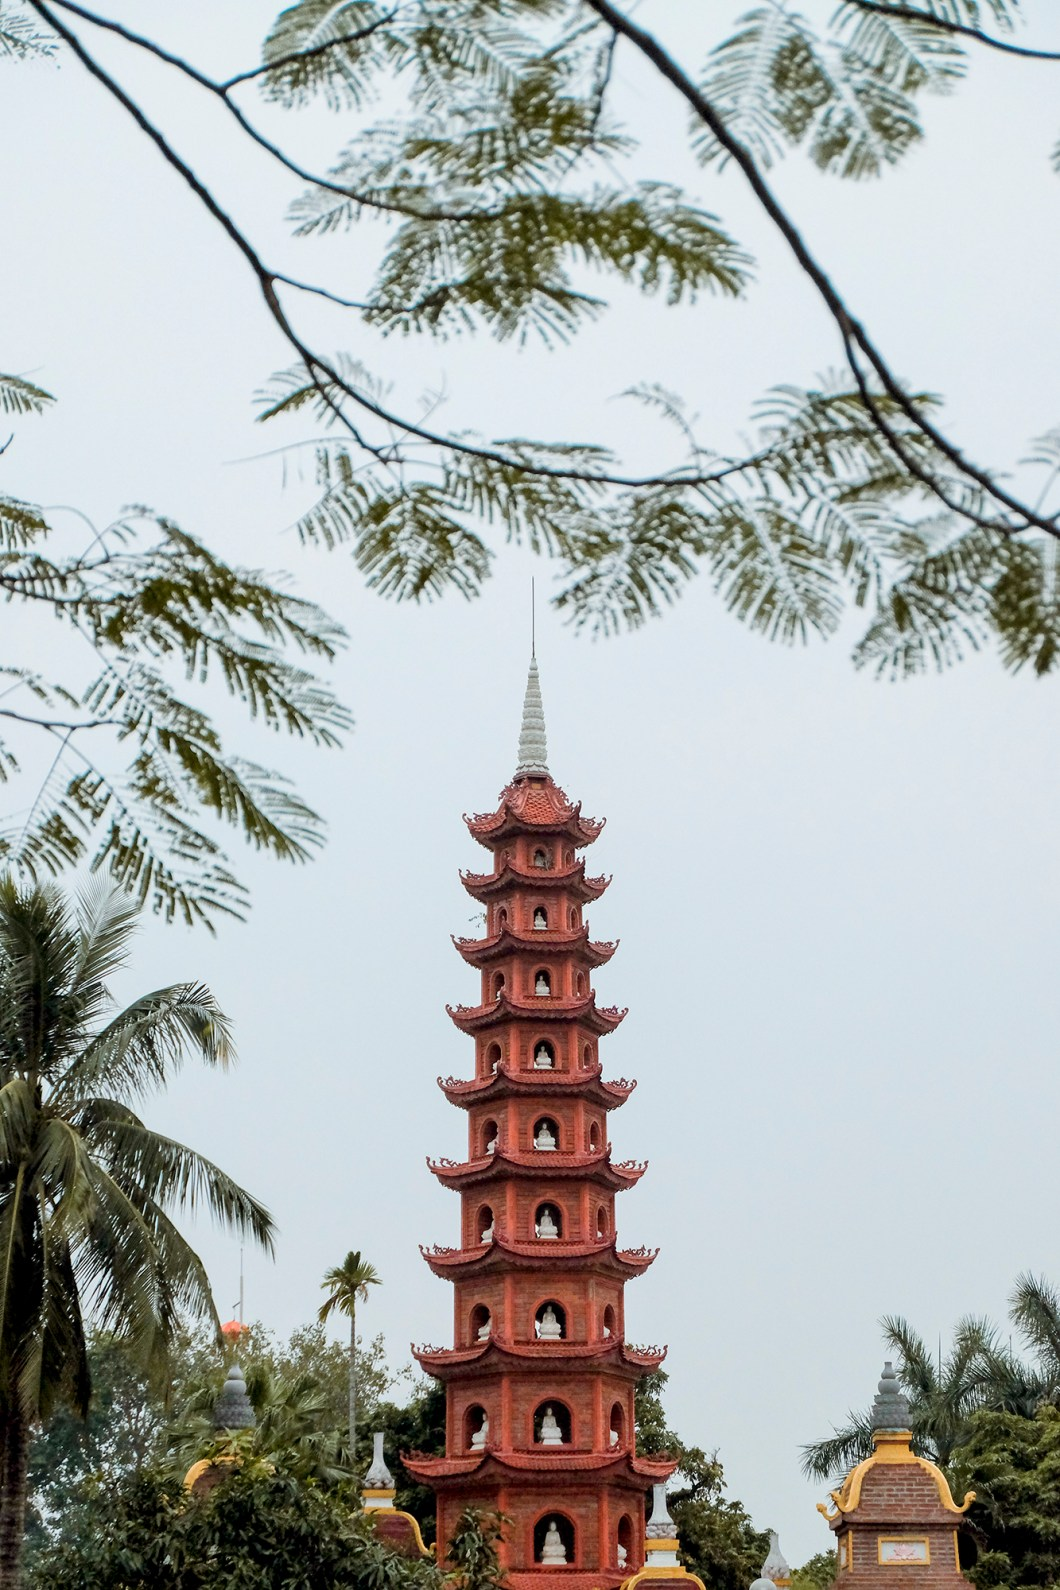 Hanoi Vietnam | How Far From Home